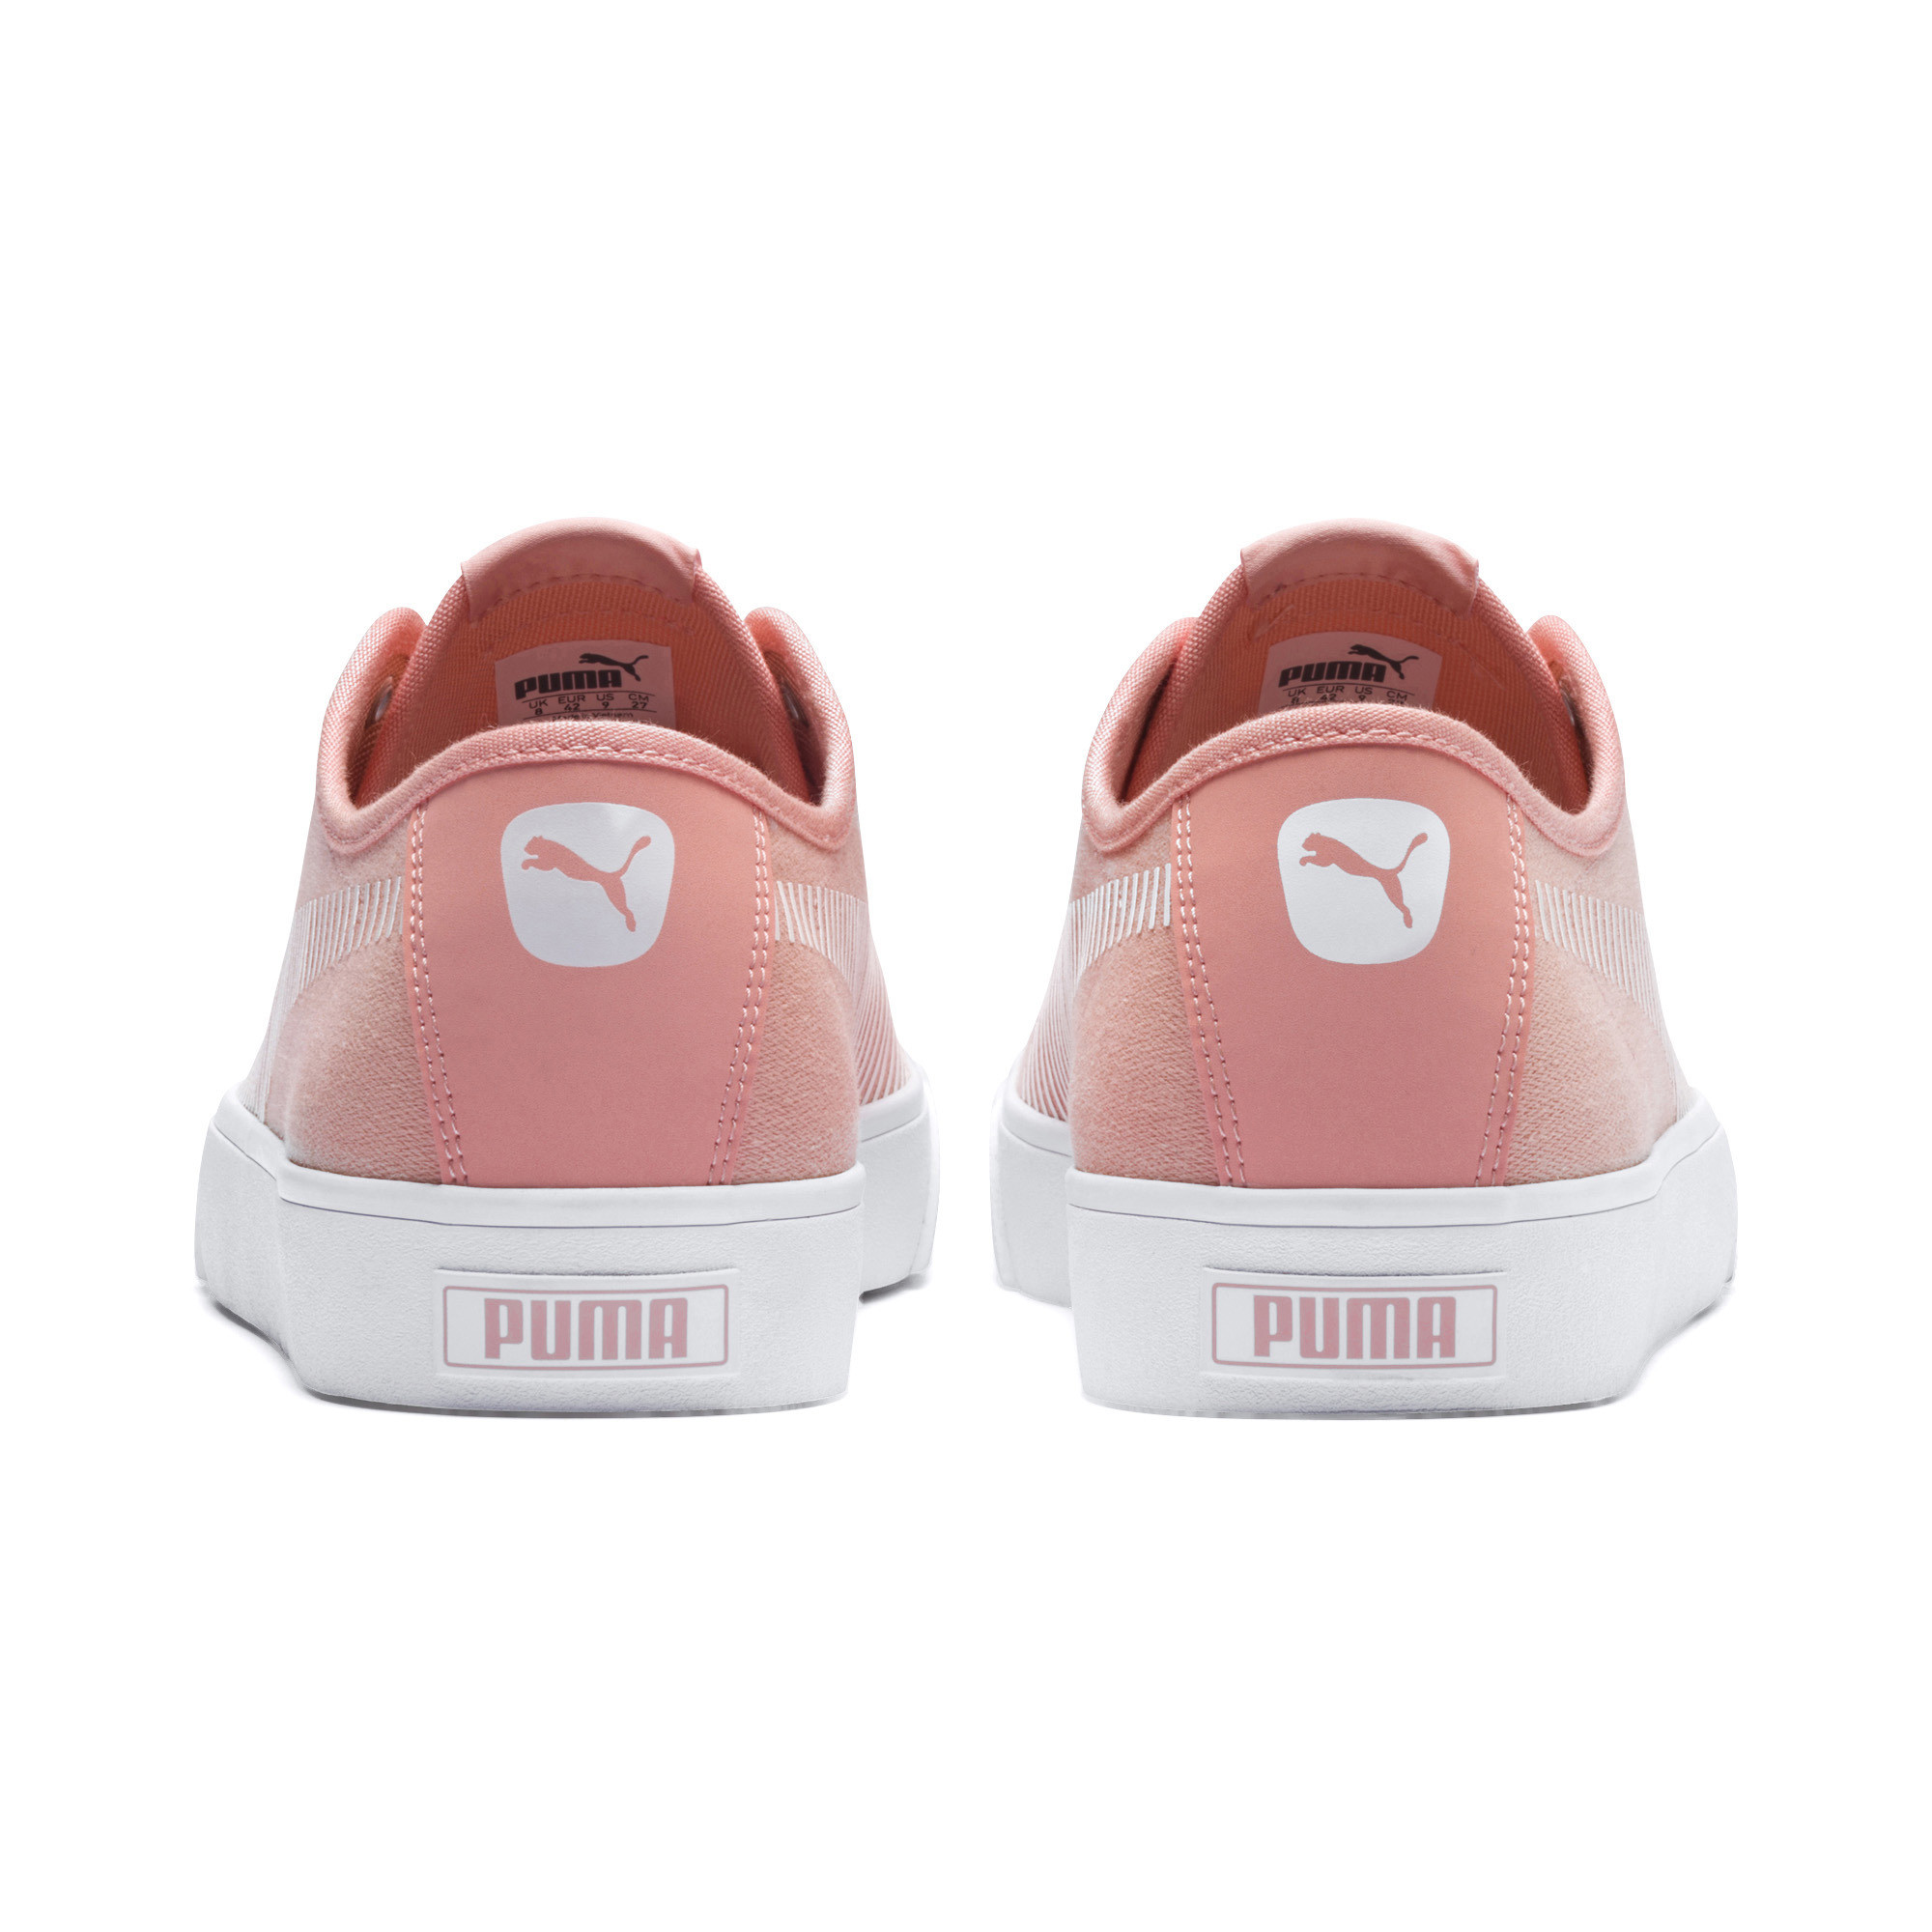 PUMA-Bari-Sneakers-Men-Shoe-Basics thumbnail 22